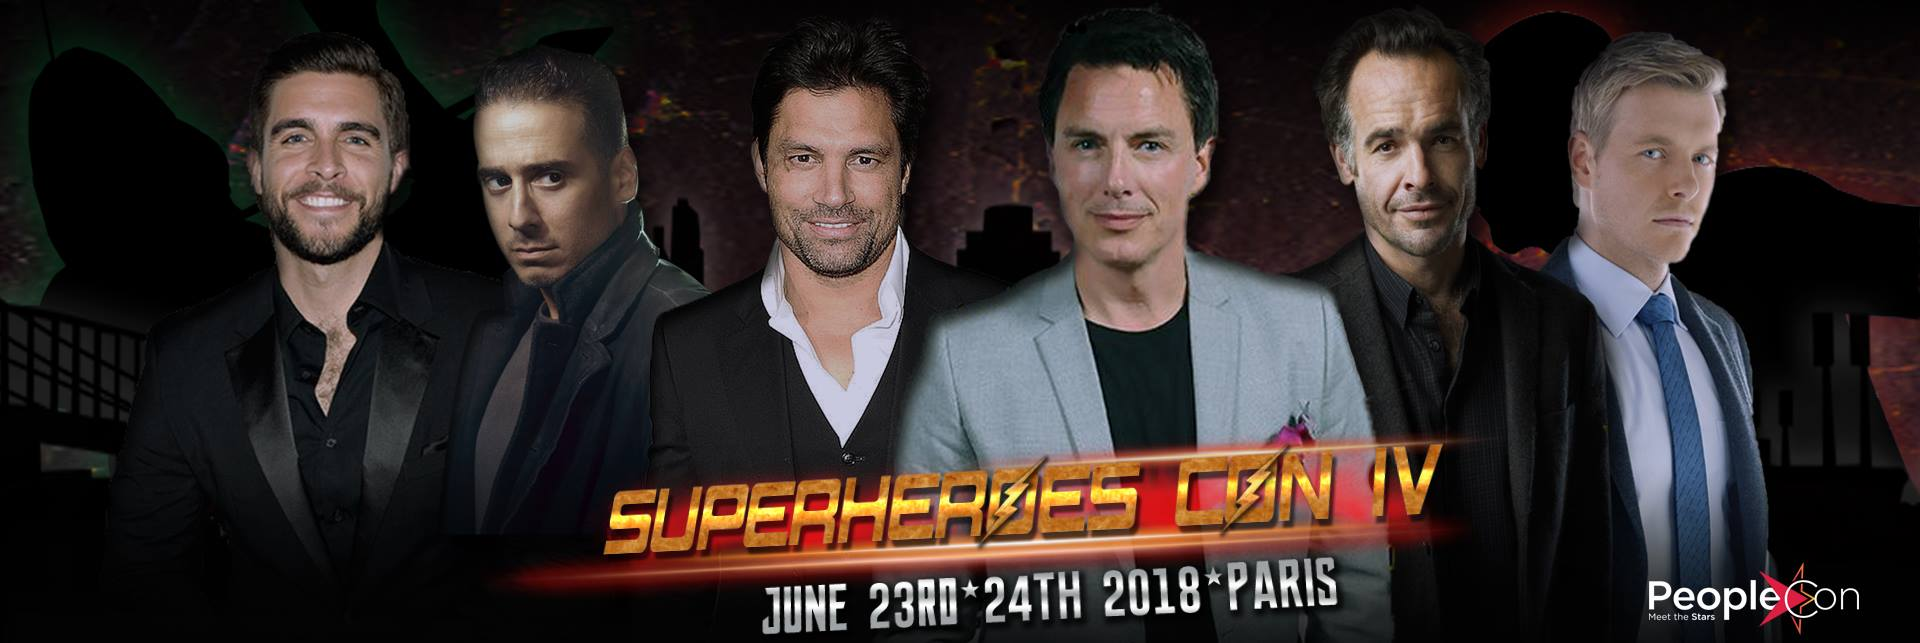 Super Heroes Con IV